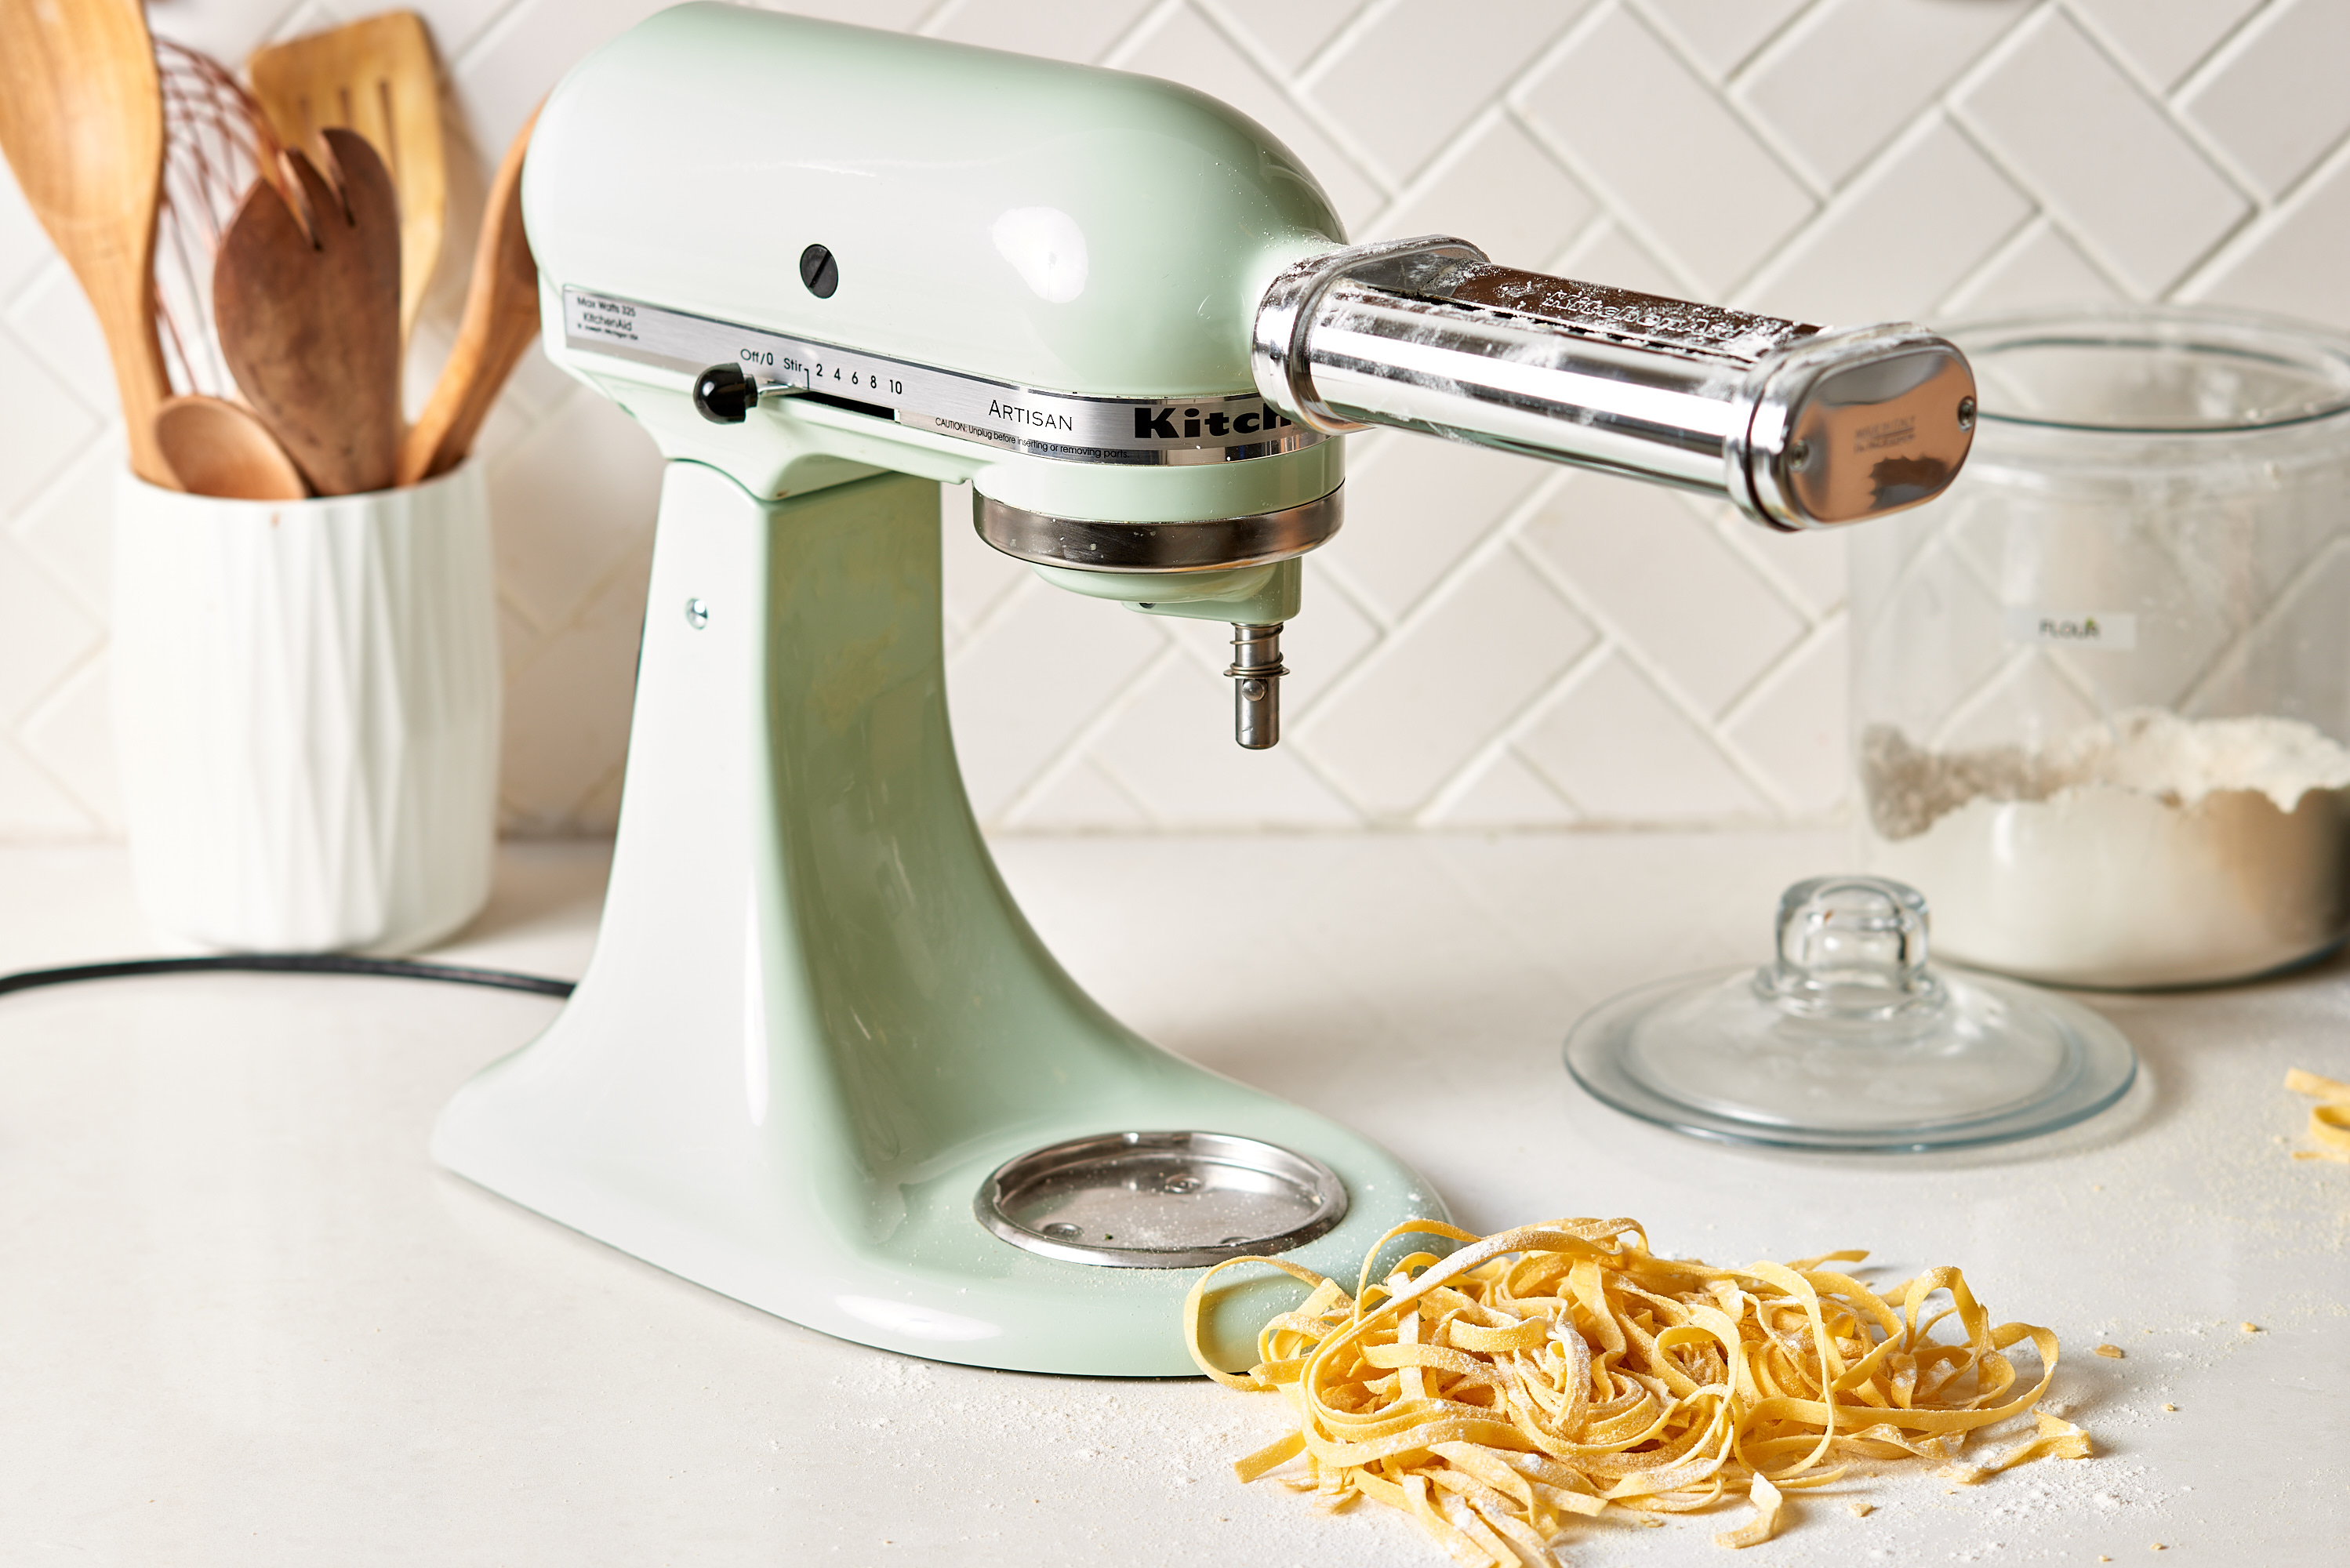 How to Clean KitchenAid Pasta Attachment | Kitchn